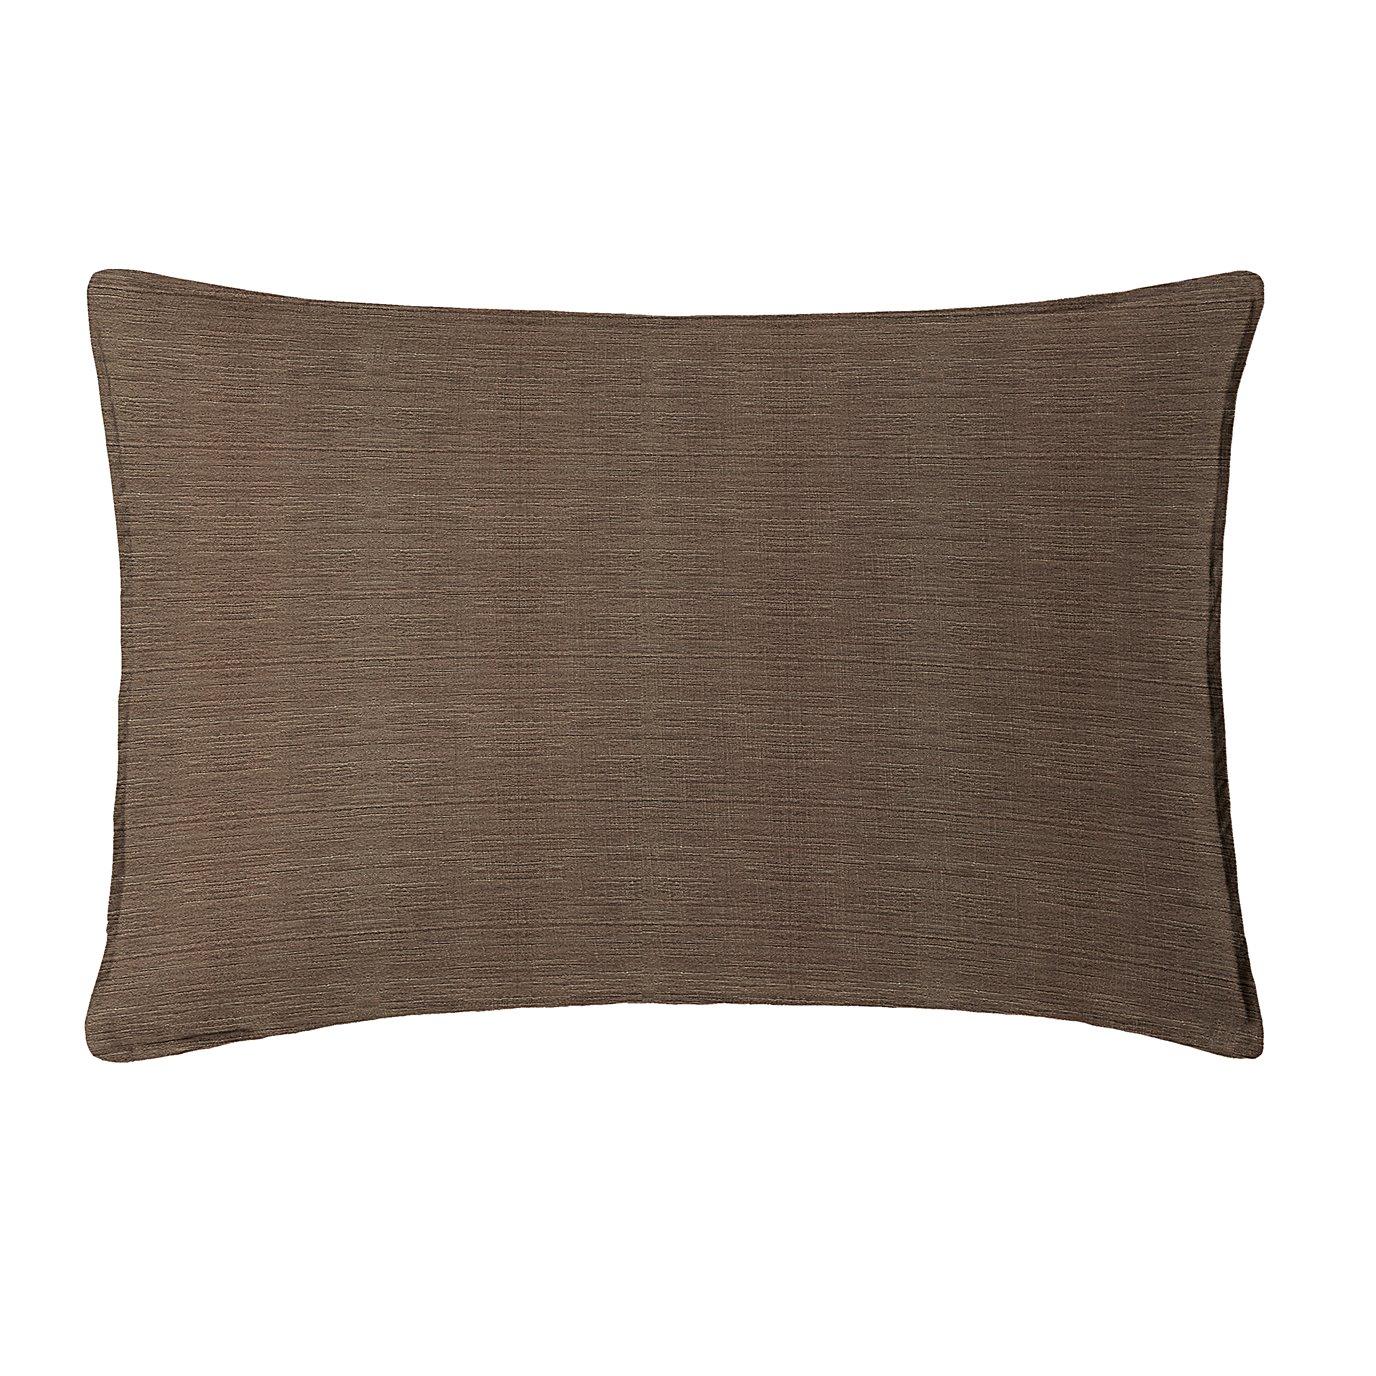 McGregor Chocolate Pillow Sham King